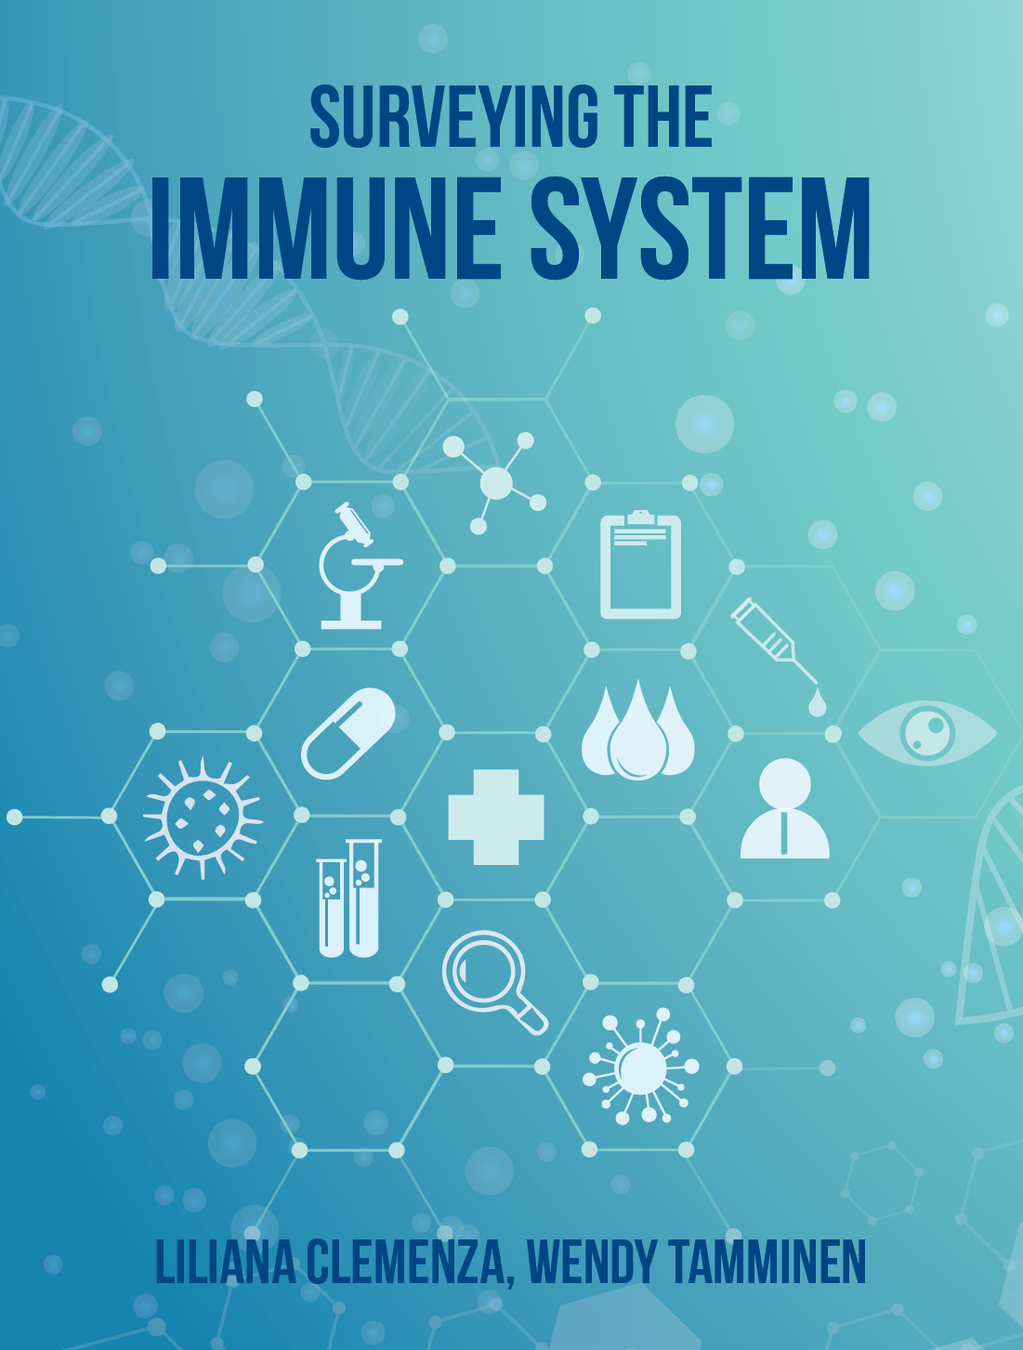 Surveying the Immune System